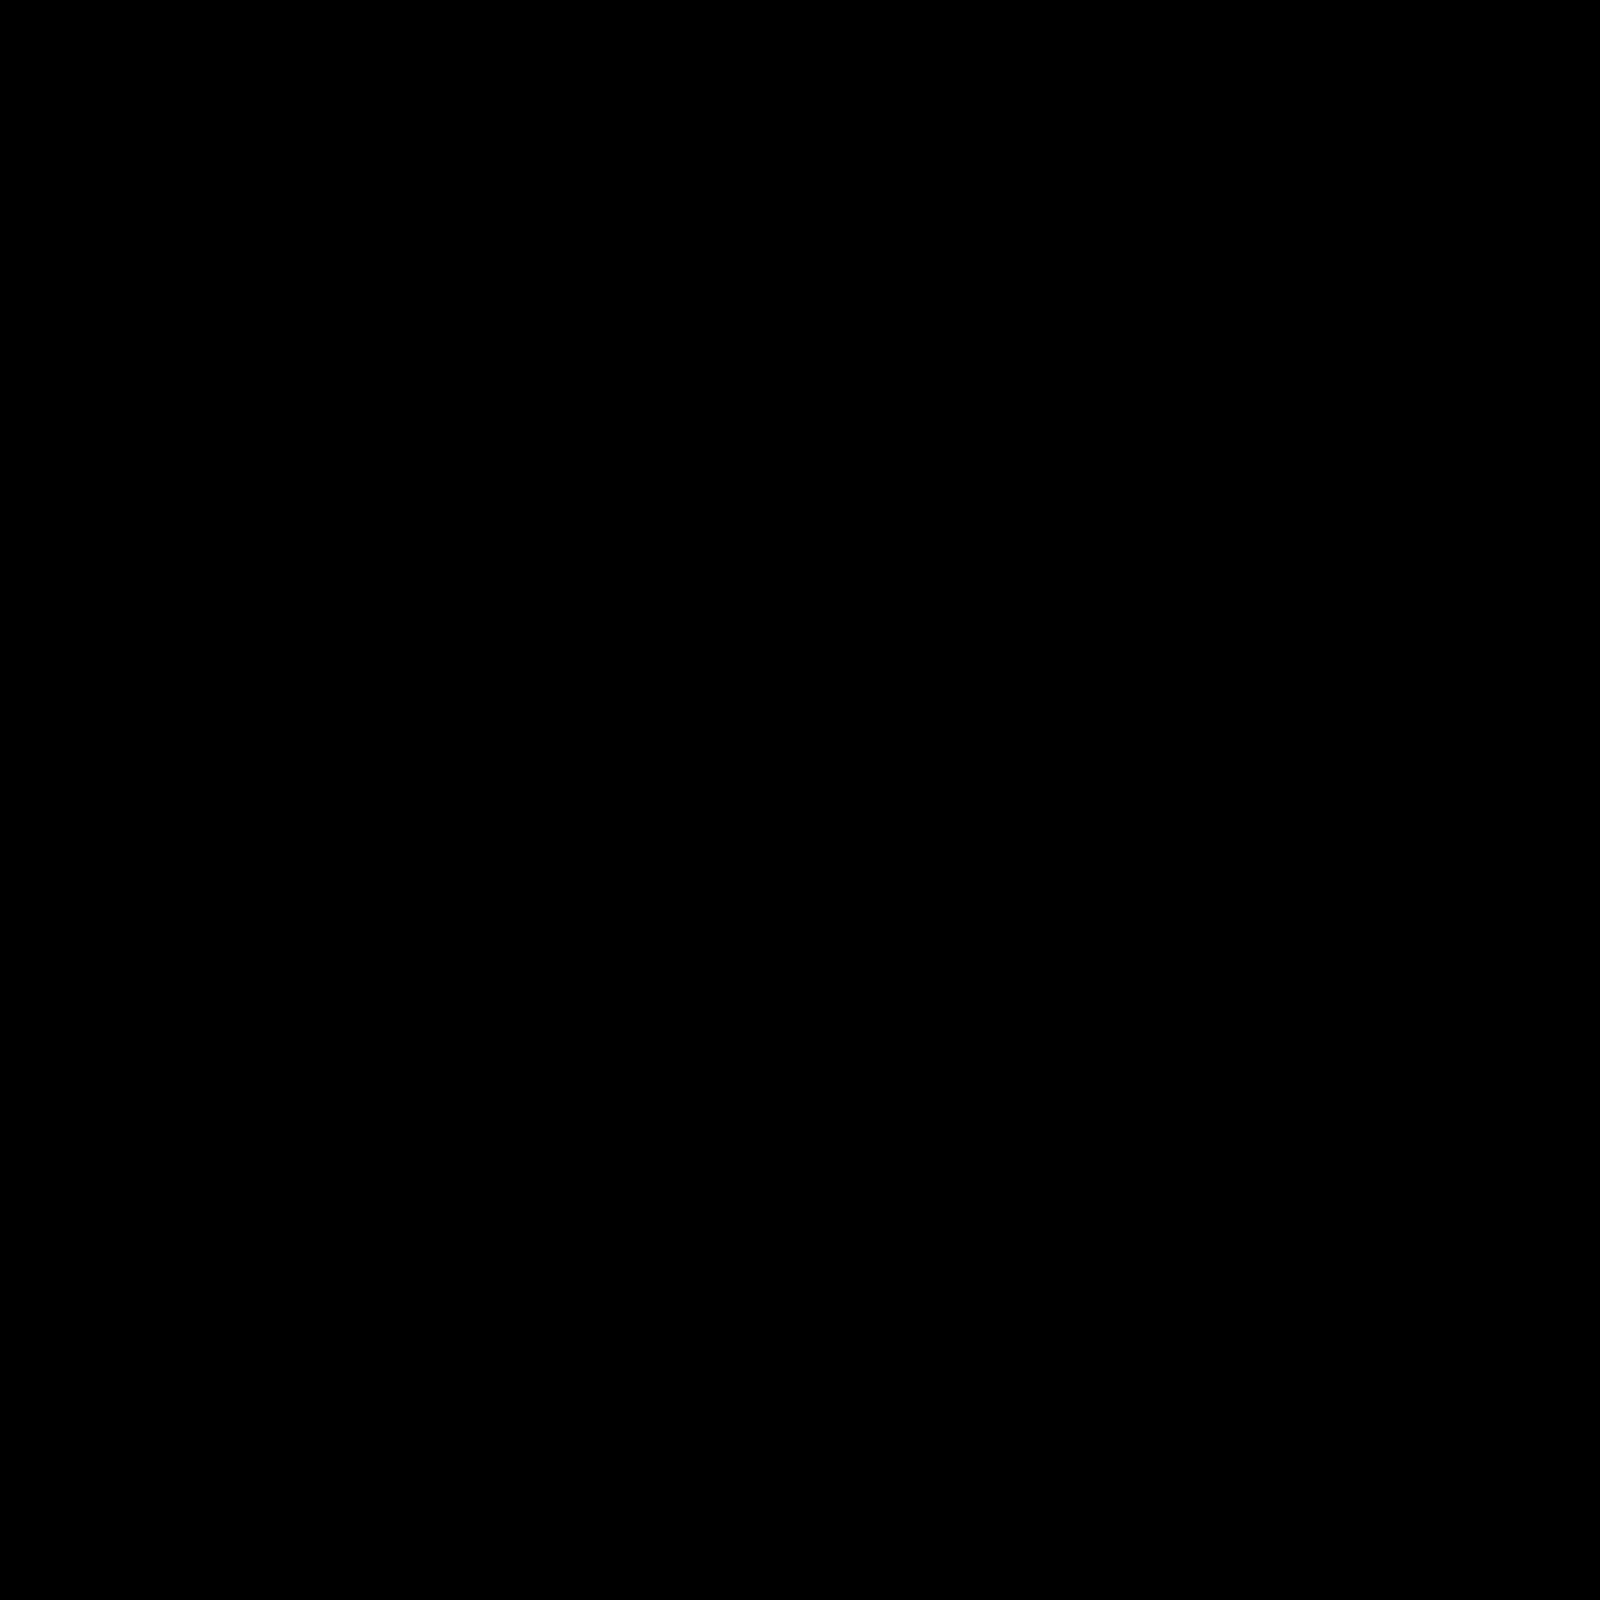 Black file transparentpng . Clipart png circle